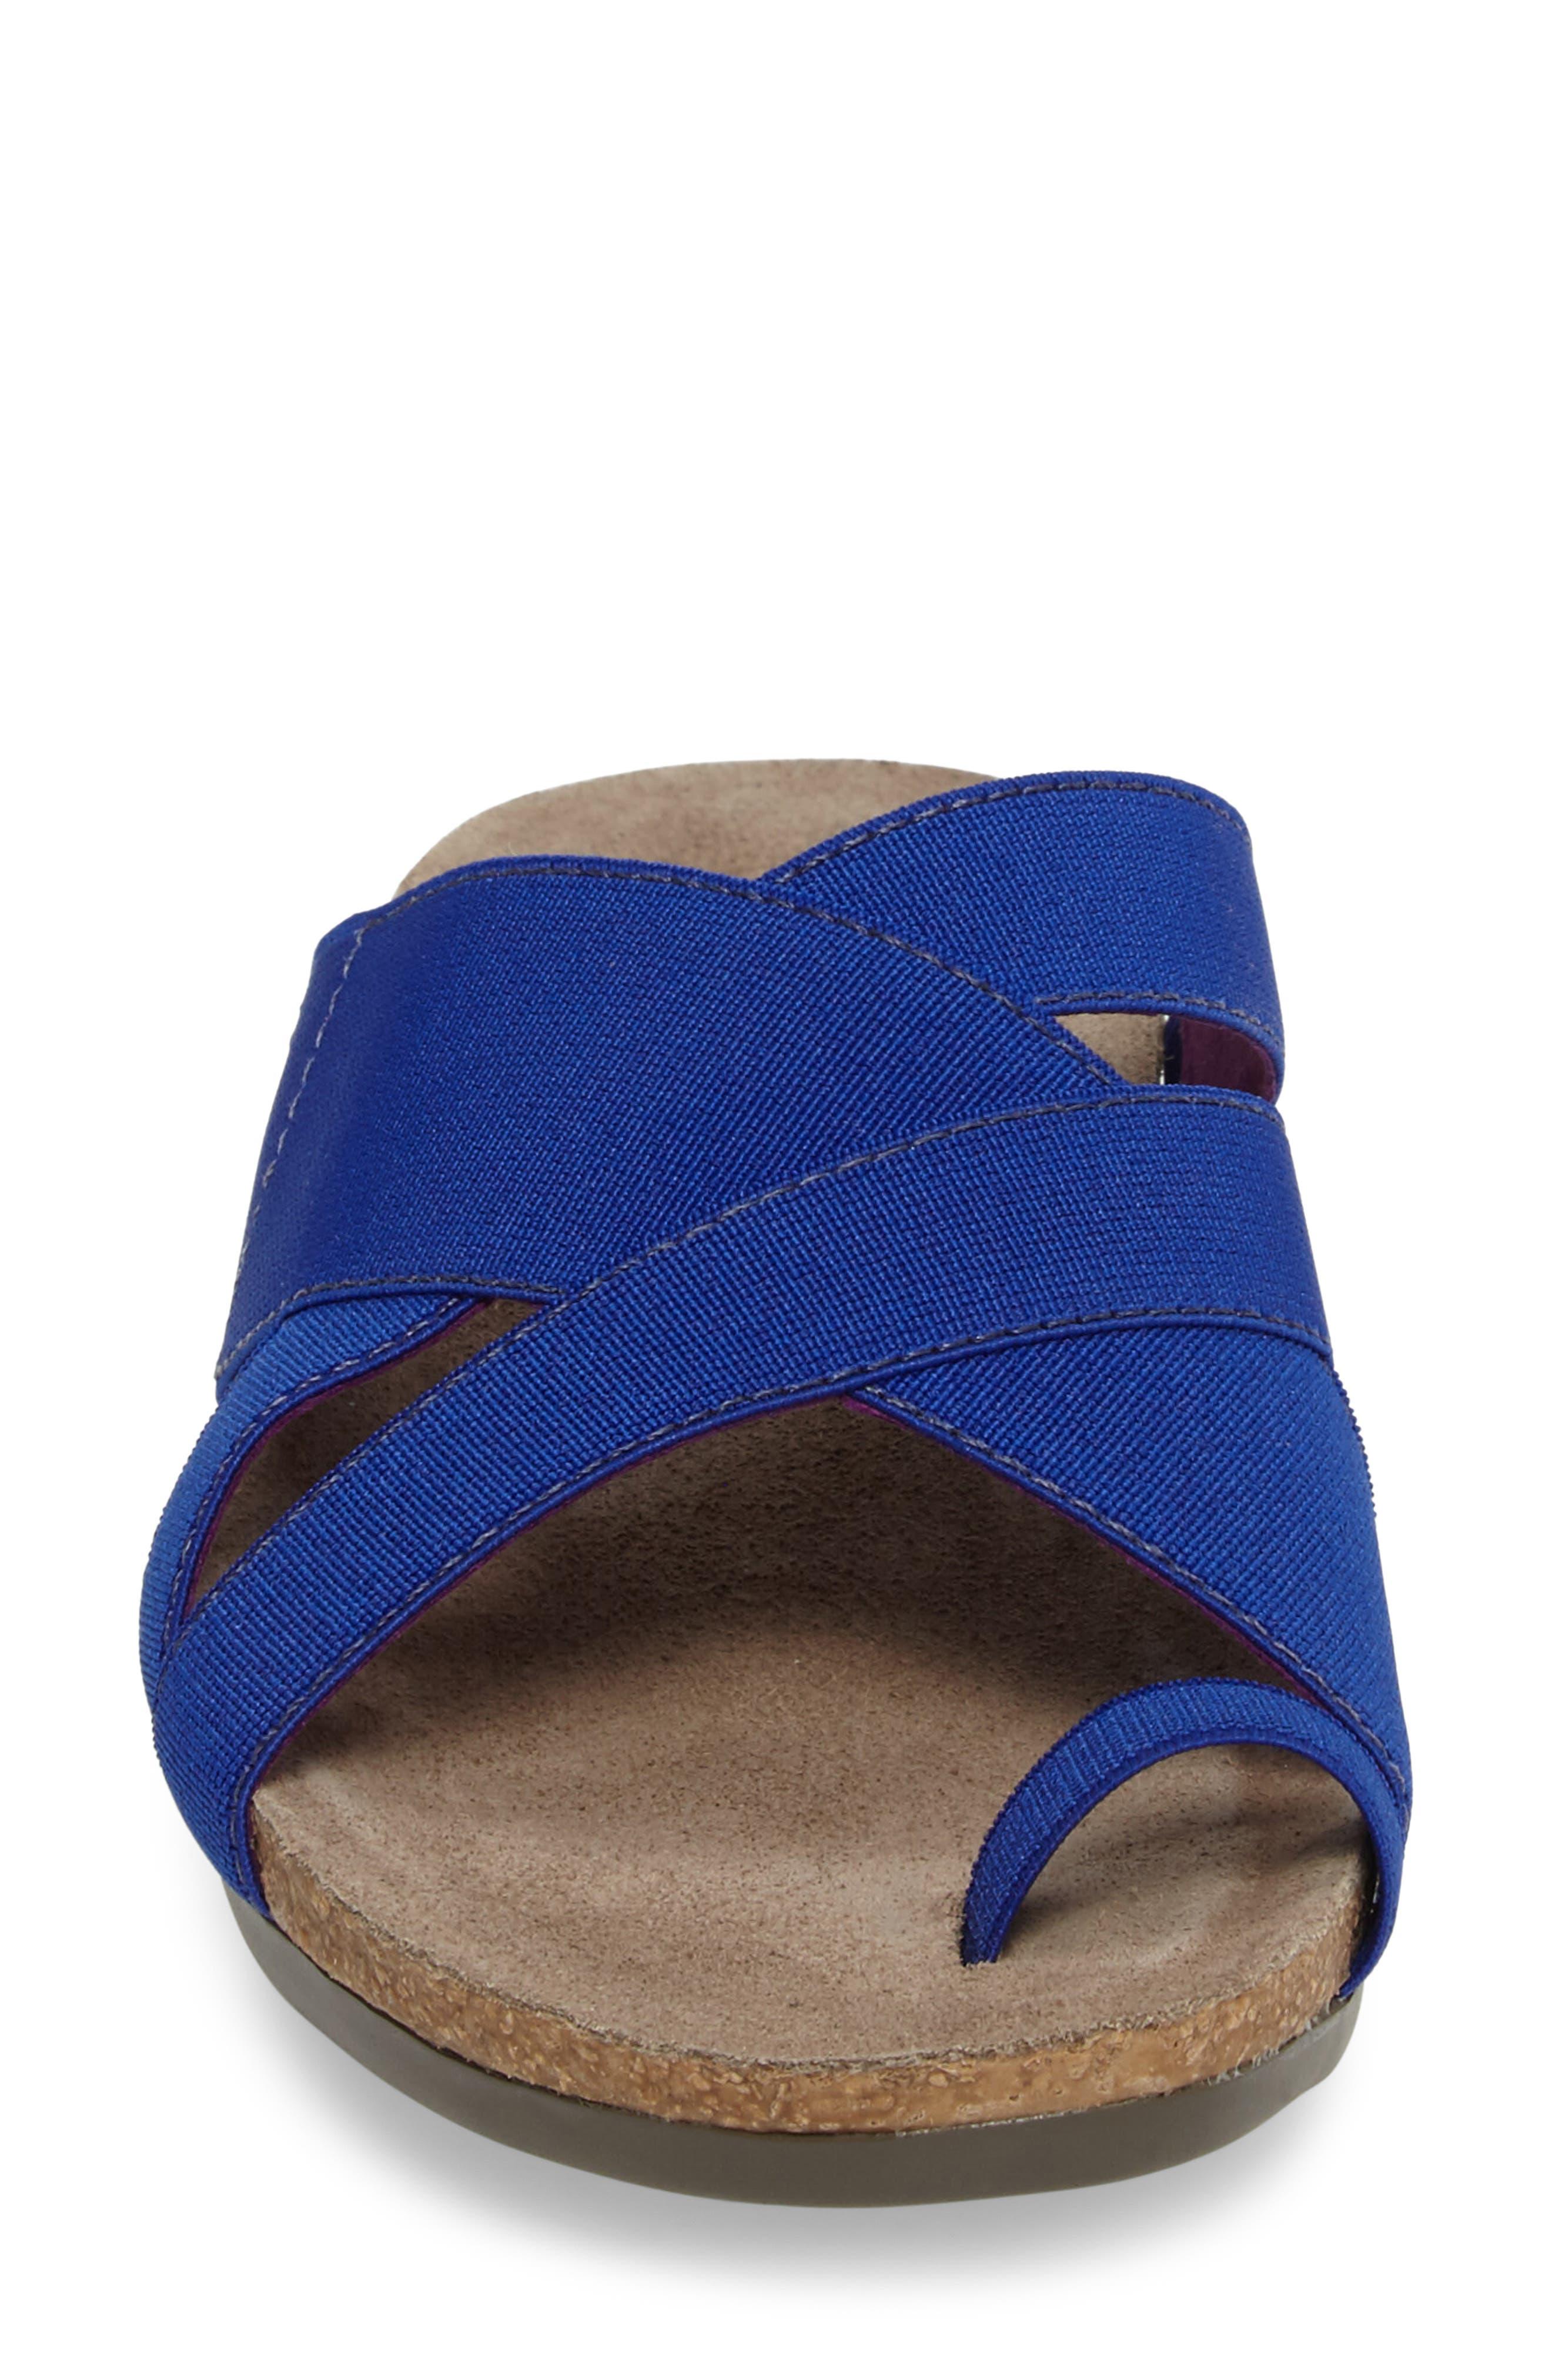 Delphi Slide Sandal,                             Alternate thumbnail 4, color,                             Blue Fabric